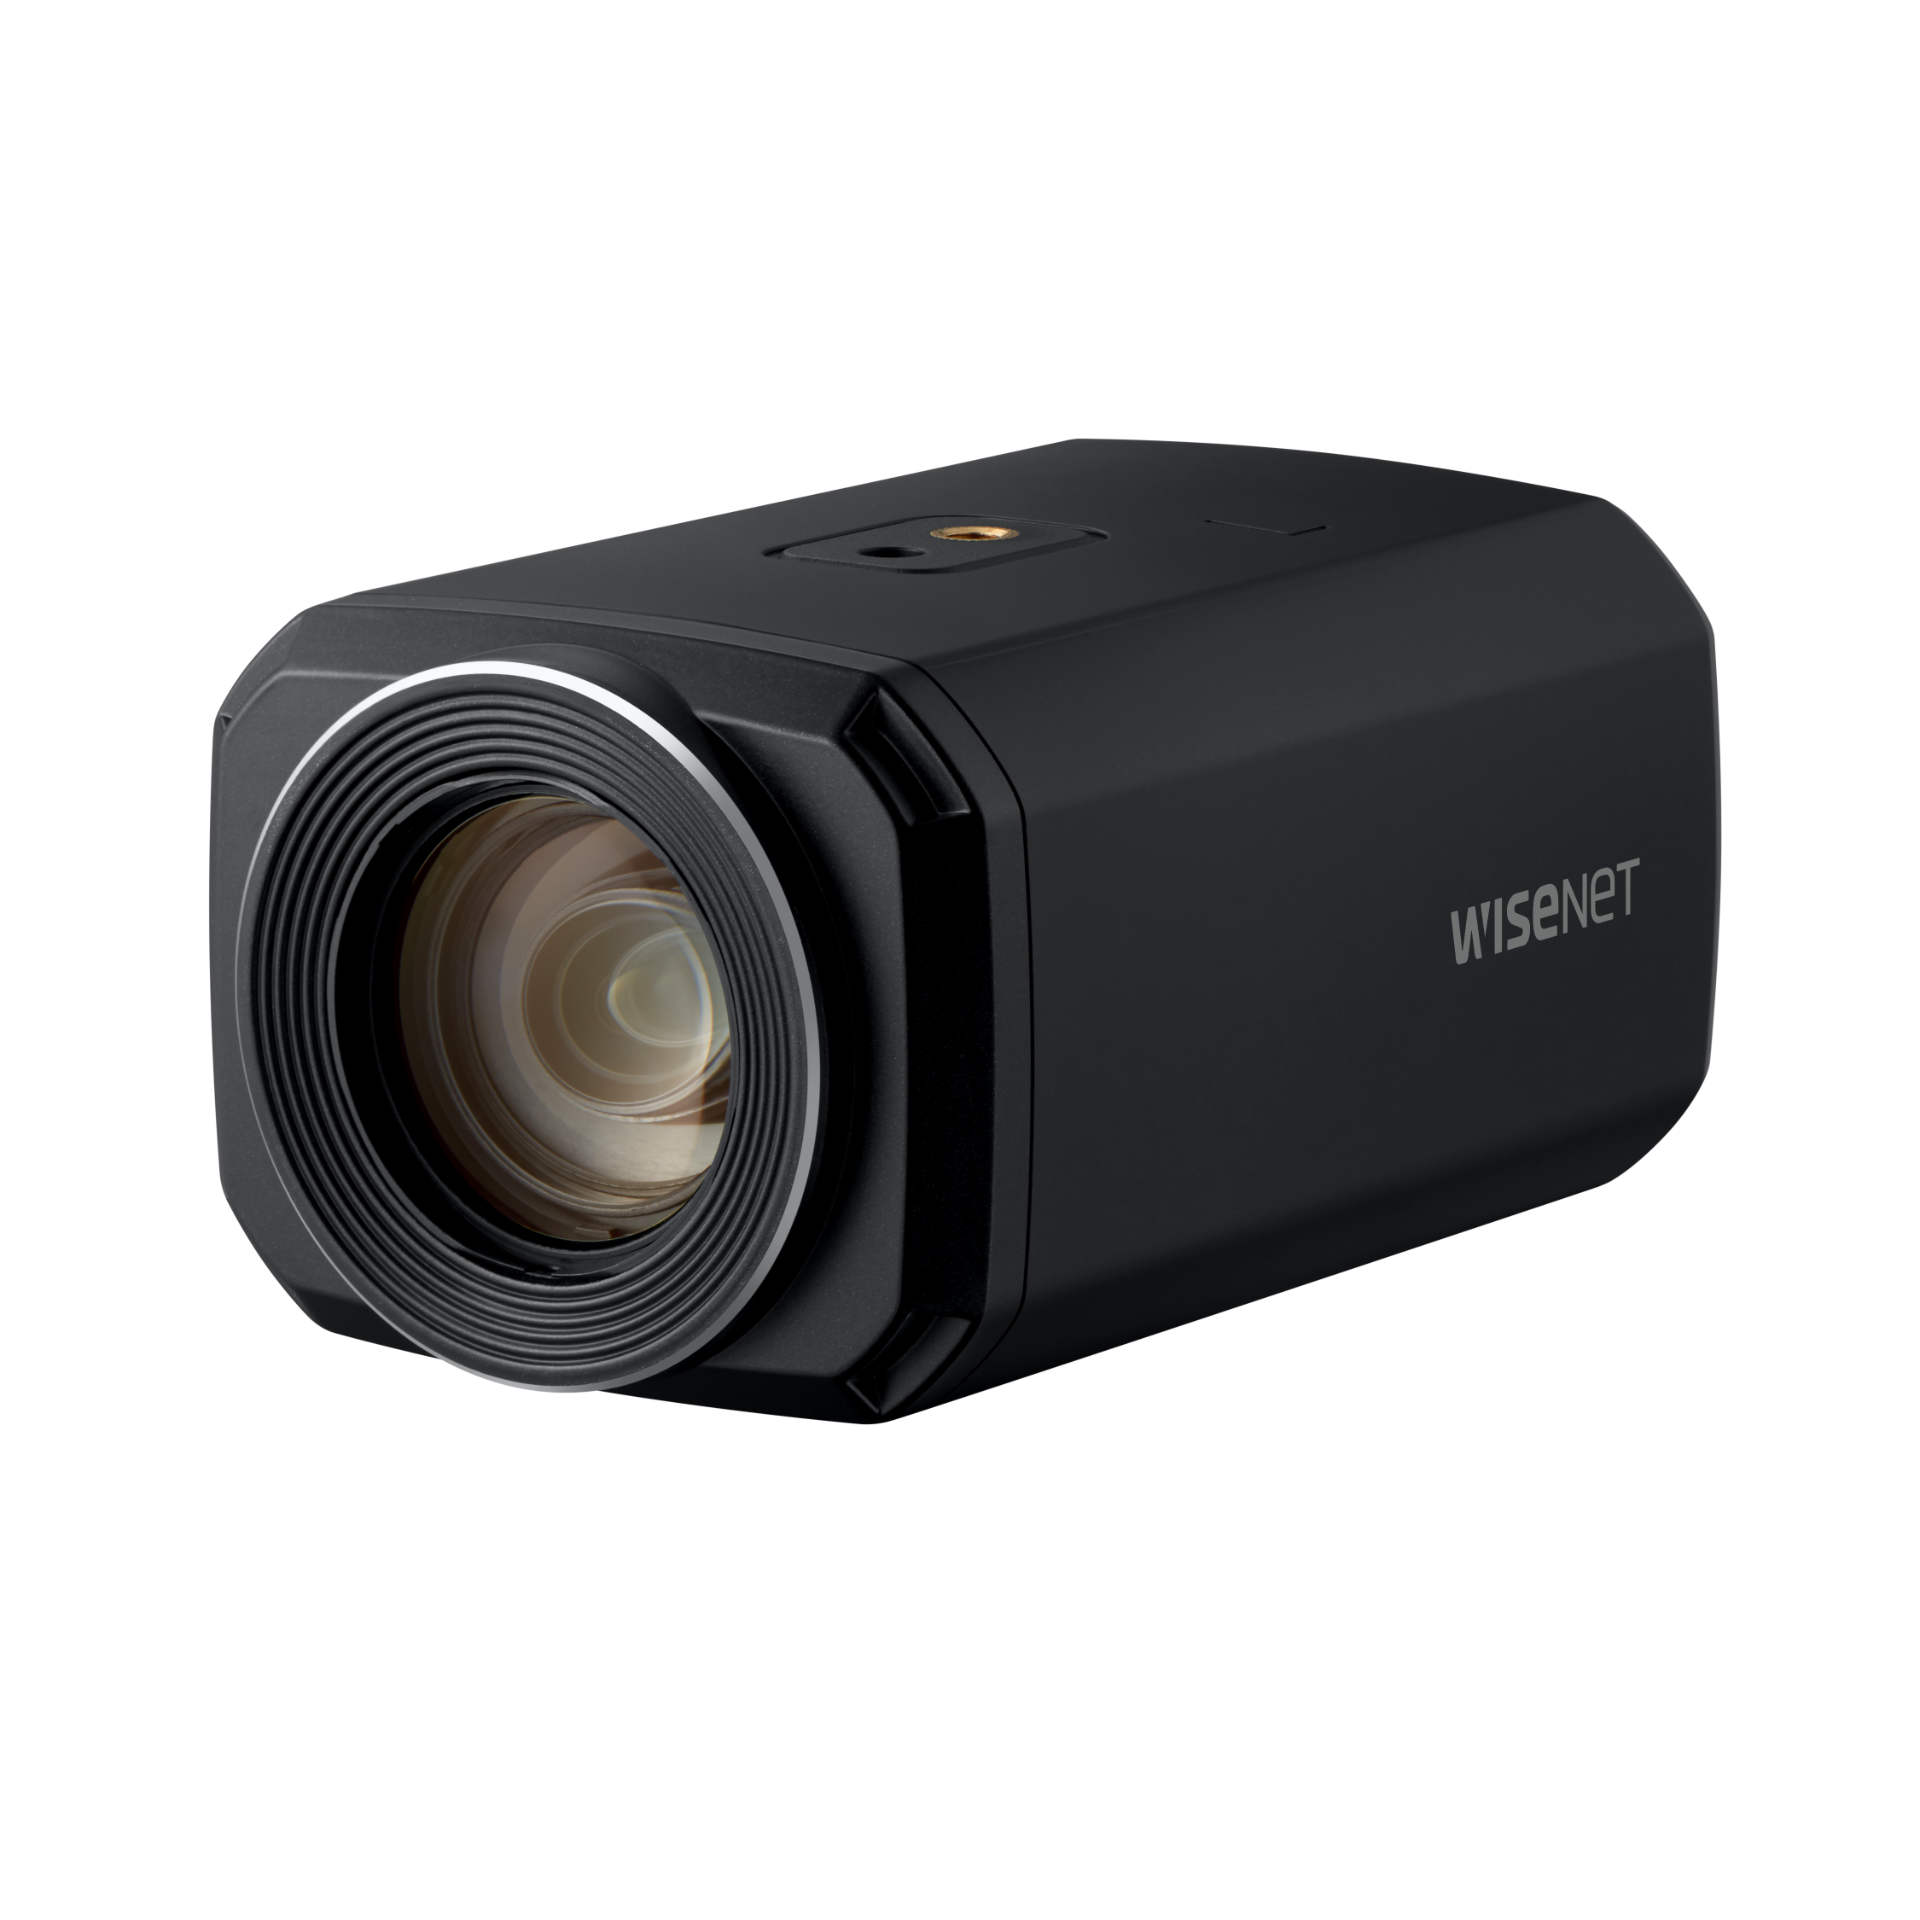 XNZ-6320 2M H.265 NW 32x Zoom Camera